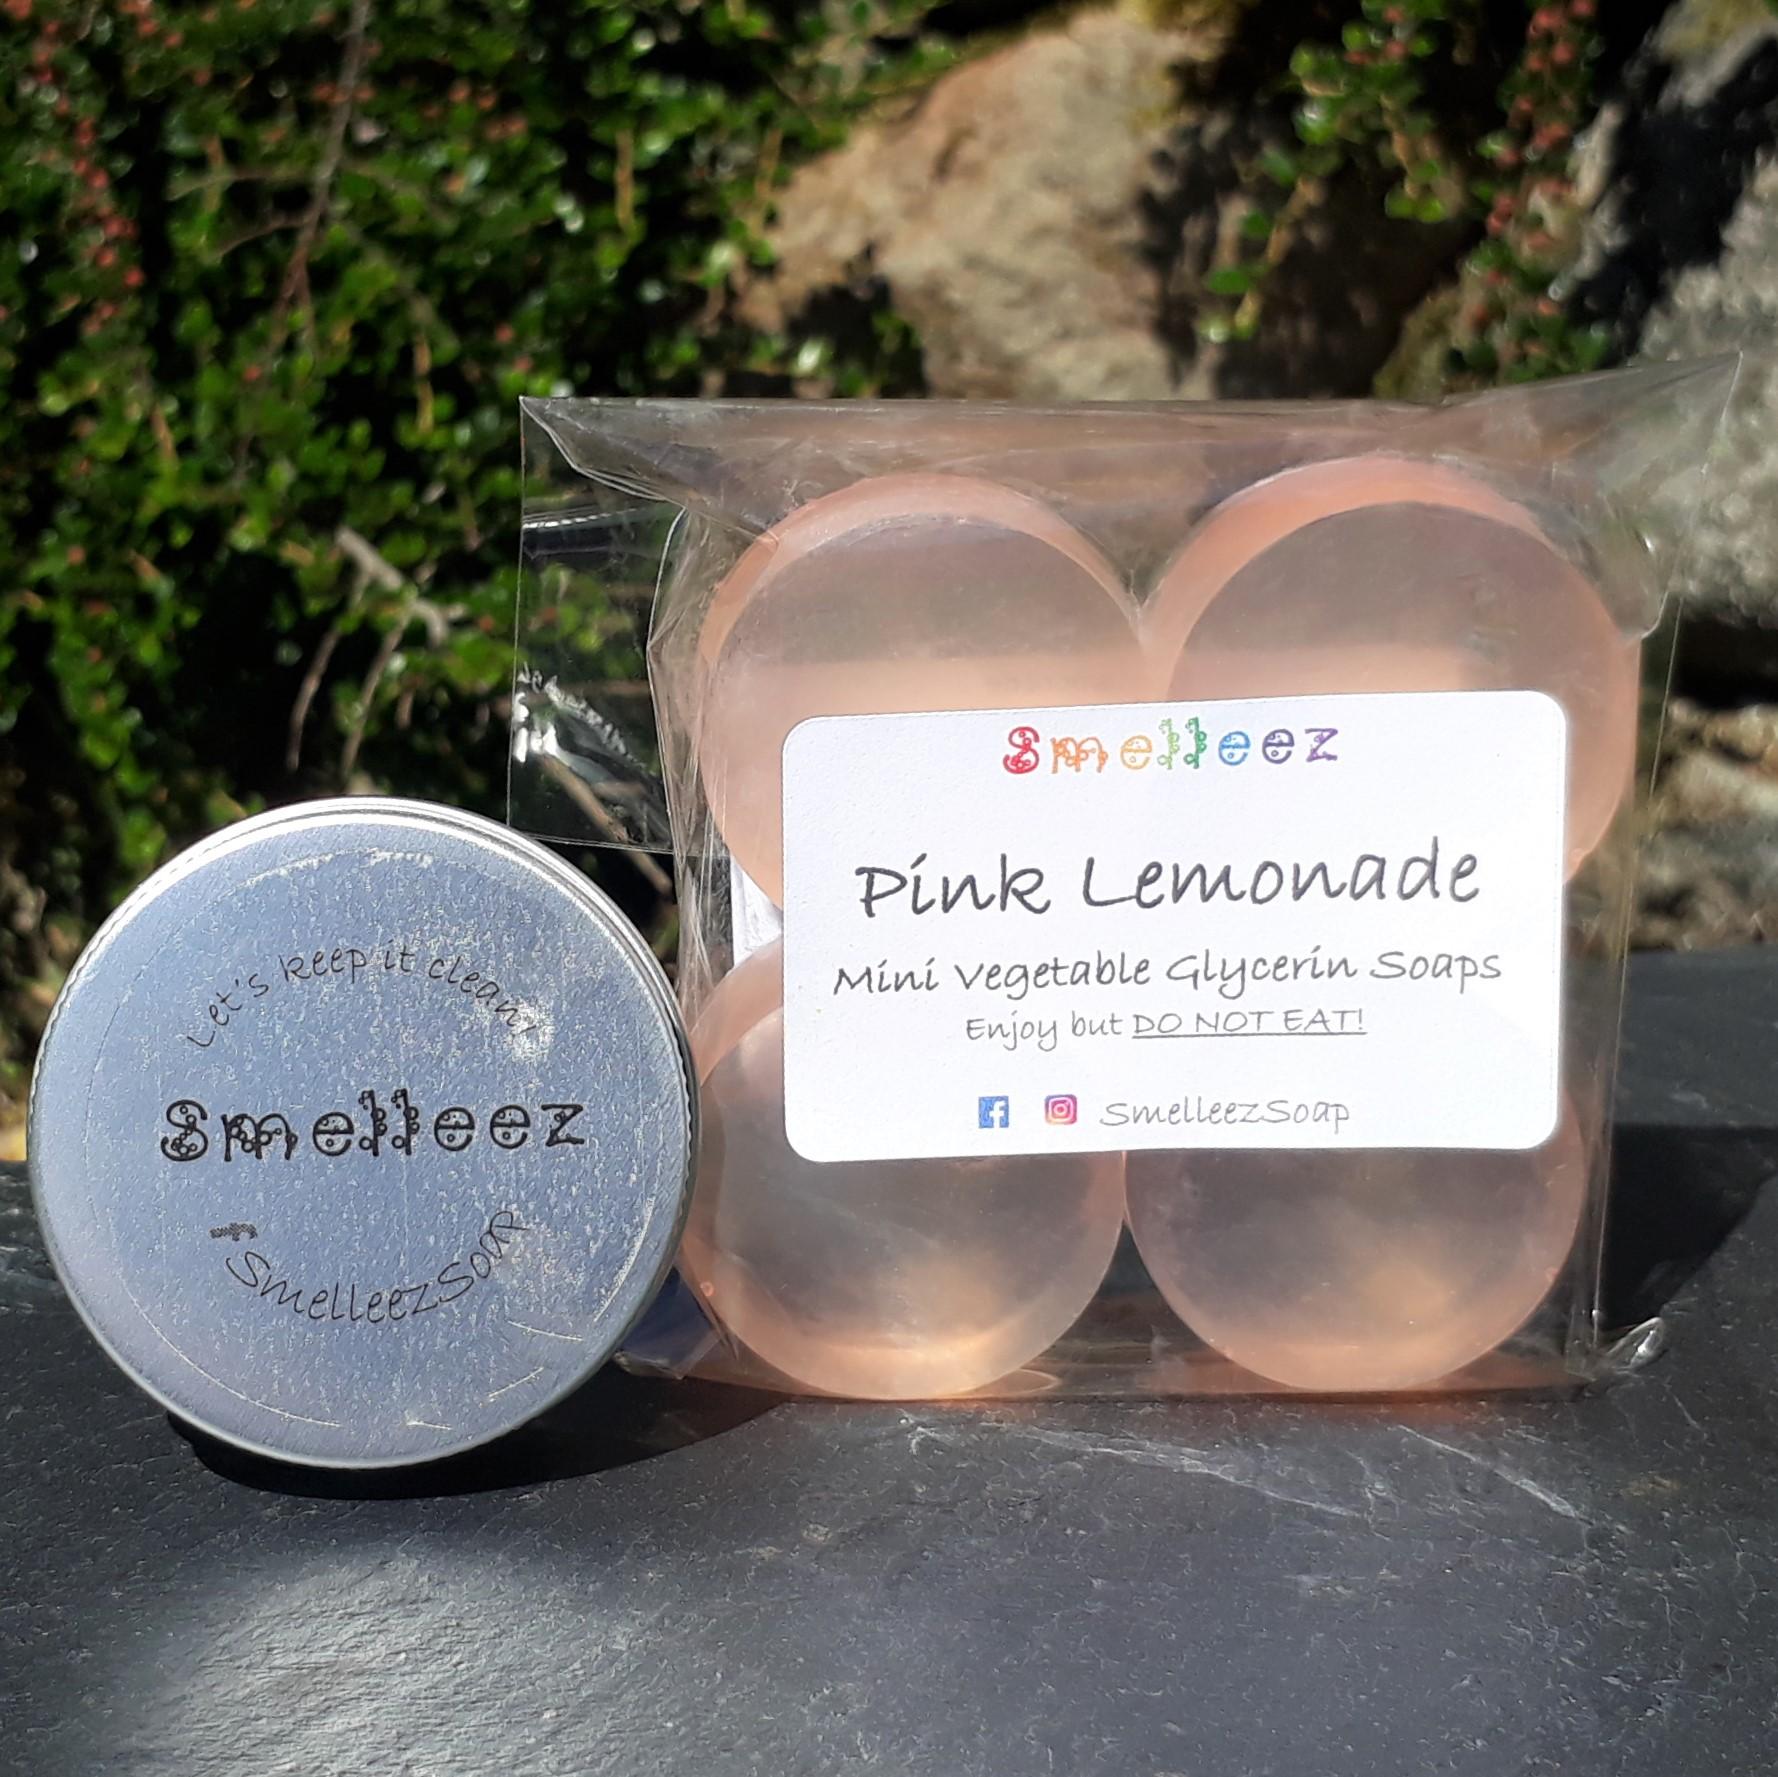 Mini Vegetable Glycerin Soap Bars & Pocket Size Tin (Pink Lemonade)